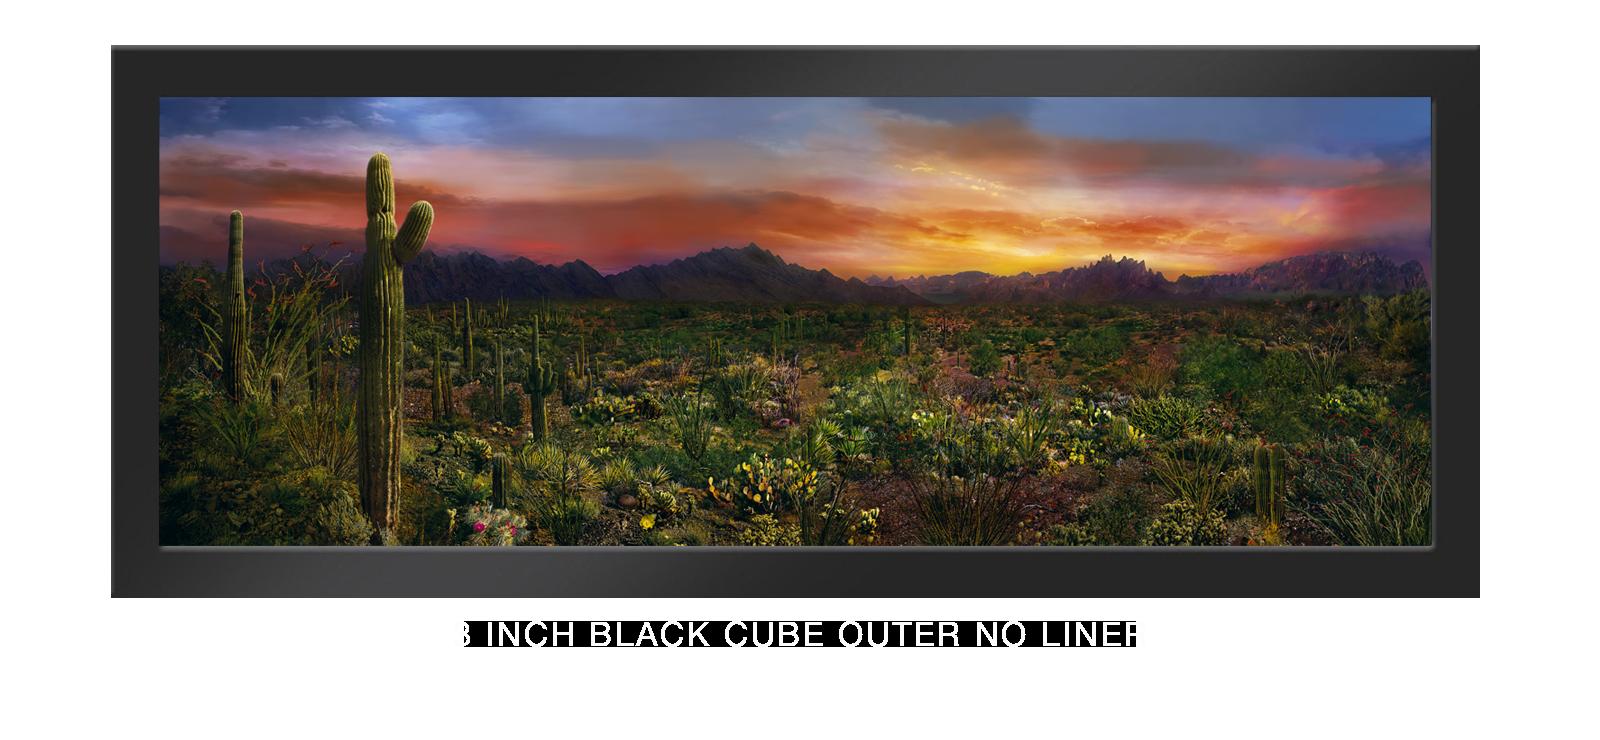 13EDEN VERNALIS 3 Inch Black Cube Outer w_No Liner T